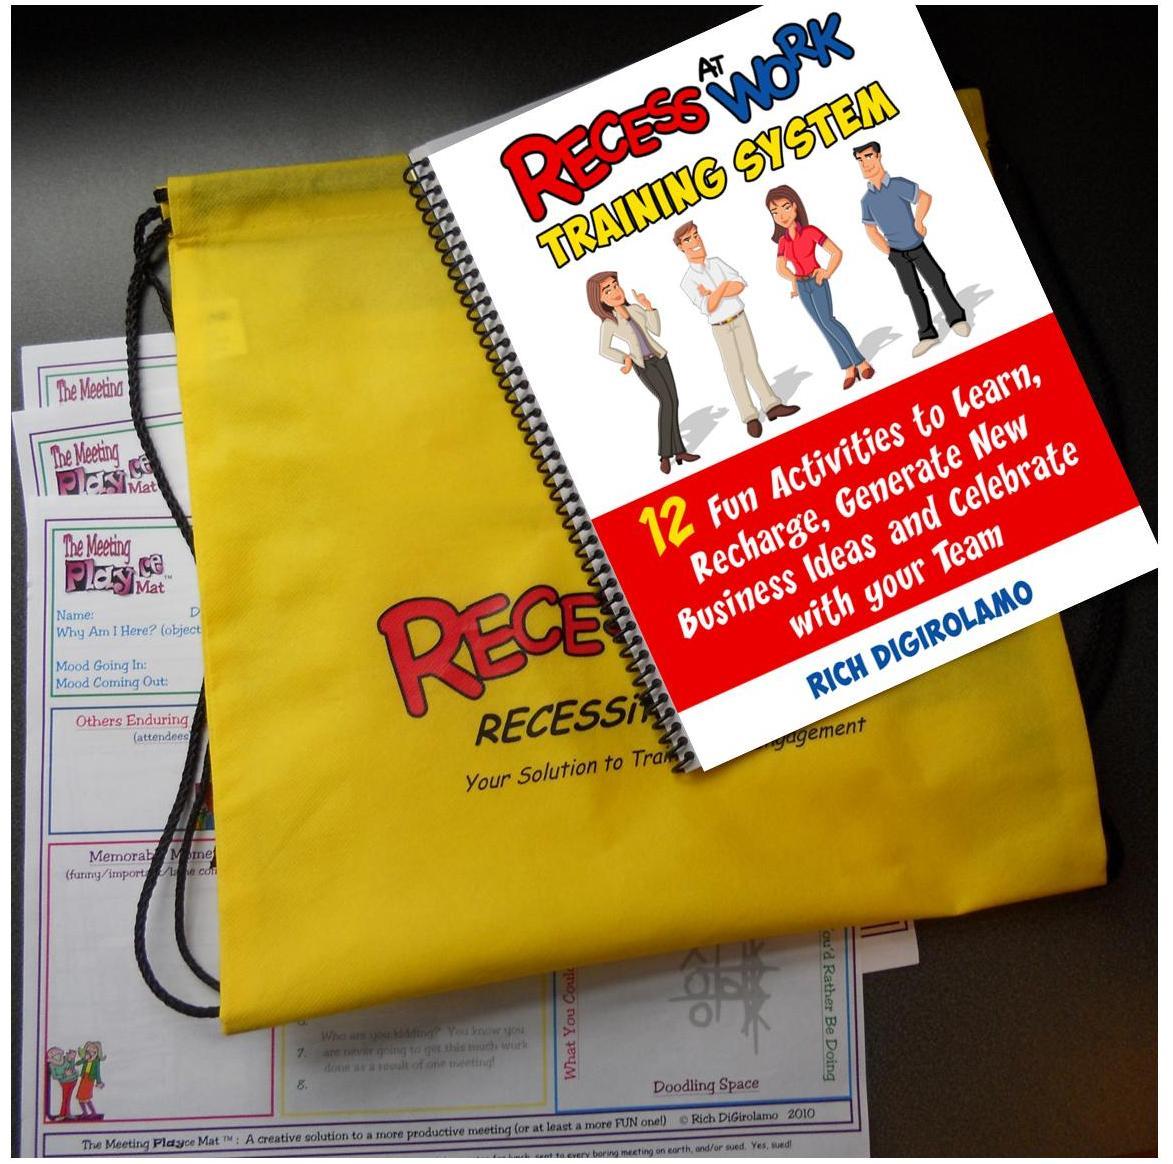 THE RECESS AT WORK Manual